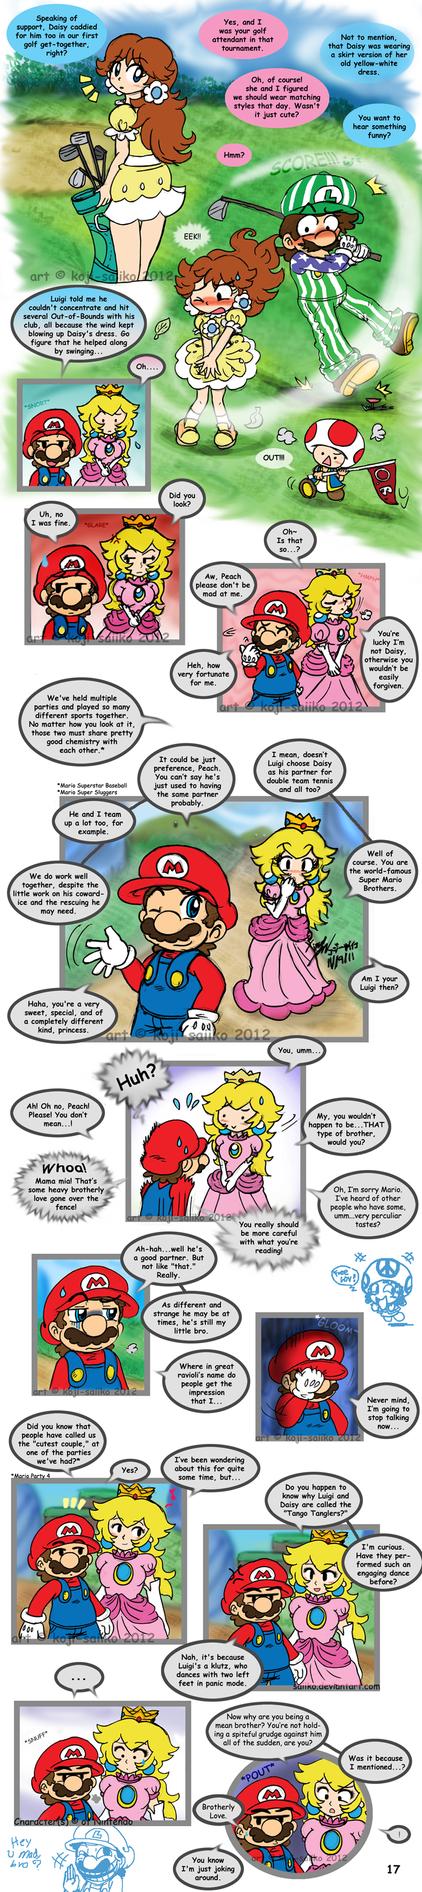 Mario: Alone at Home Pg 17 (...END) by saiiko